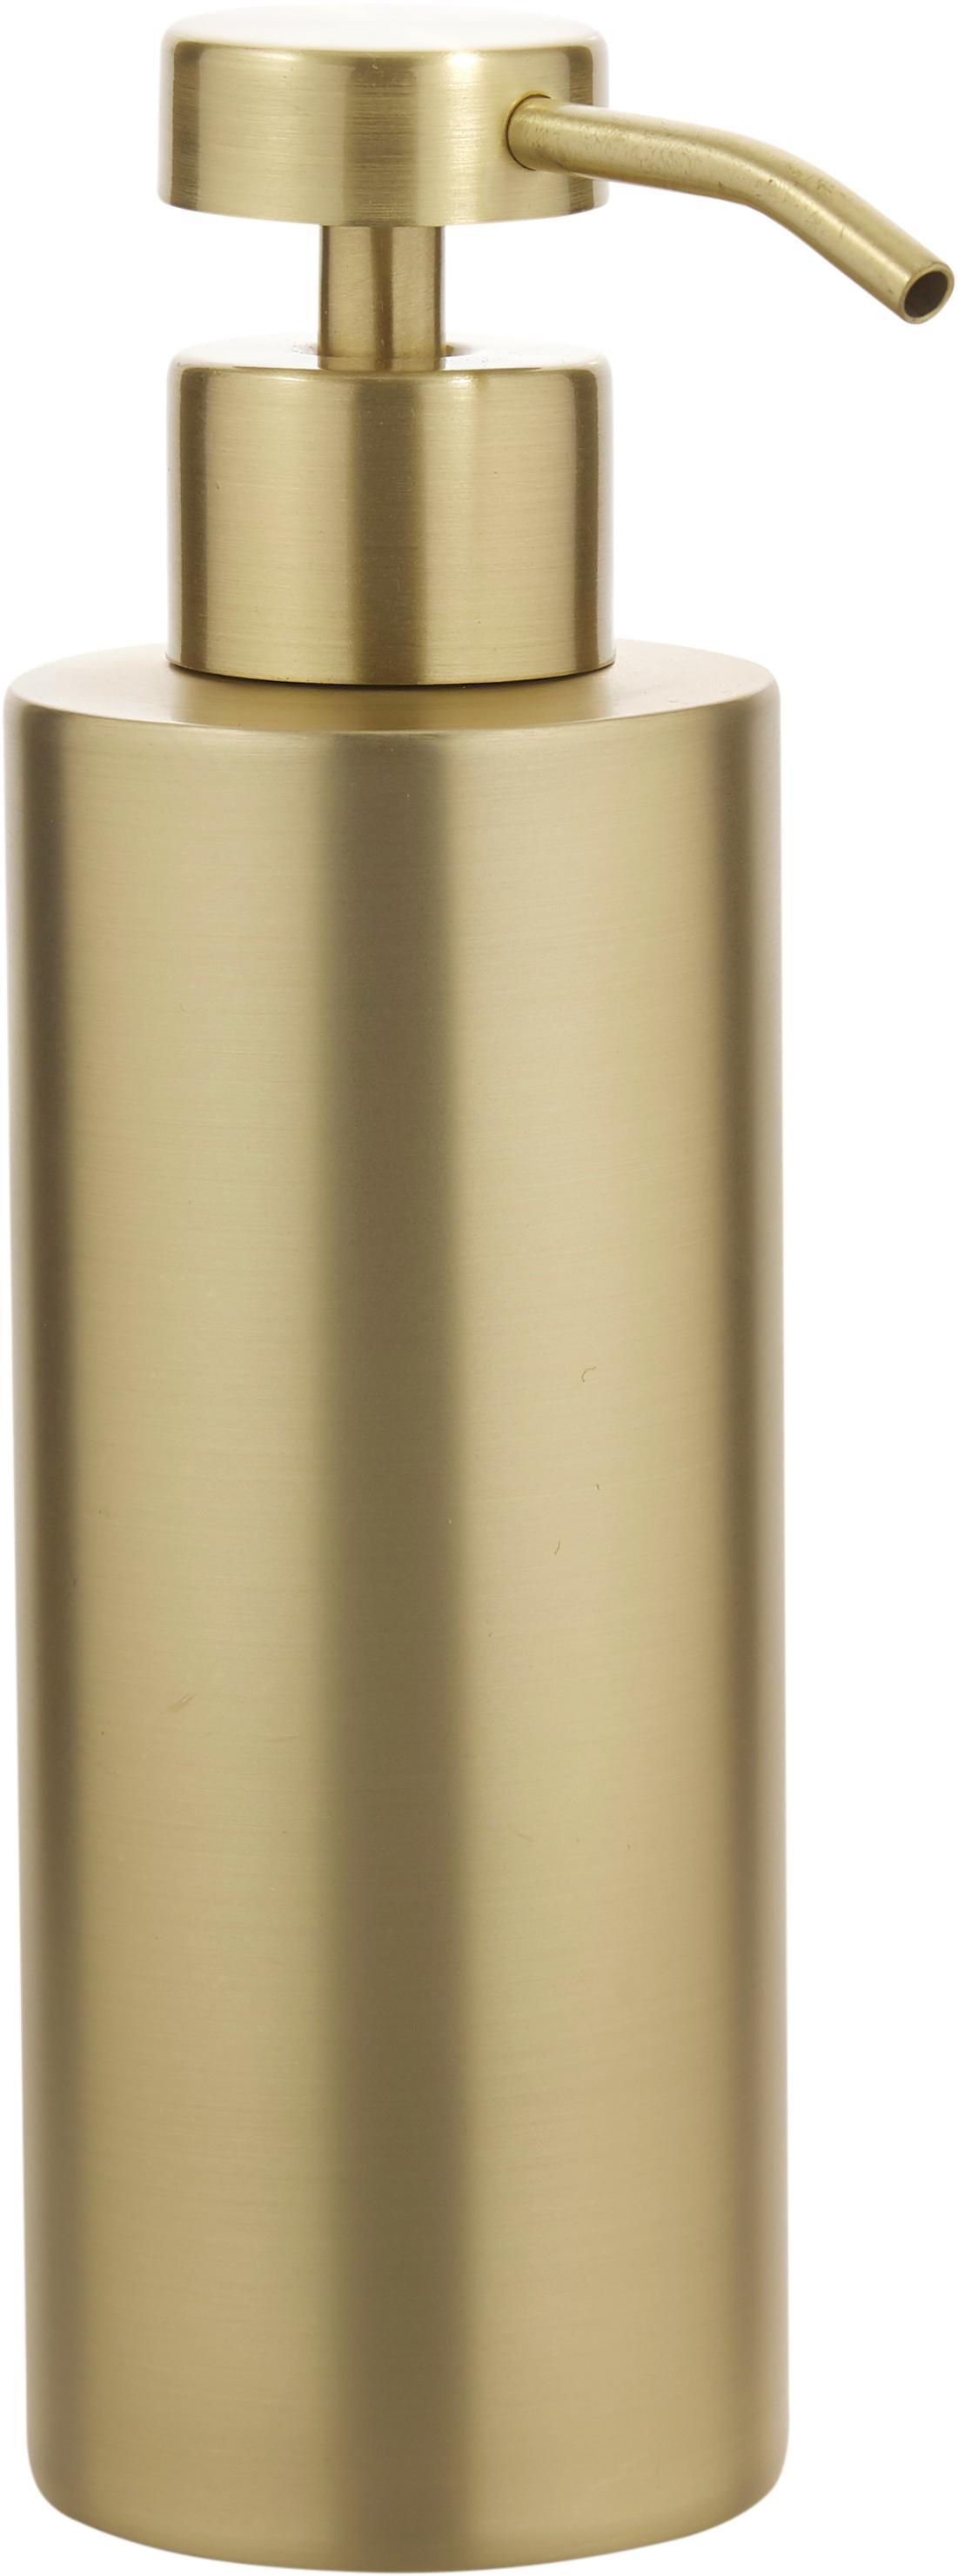 Edelstahl-Seifenspender Onyar, Edelstahl, beschichtet, Messingfarben, Ø 6 x H 18 cm